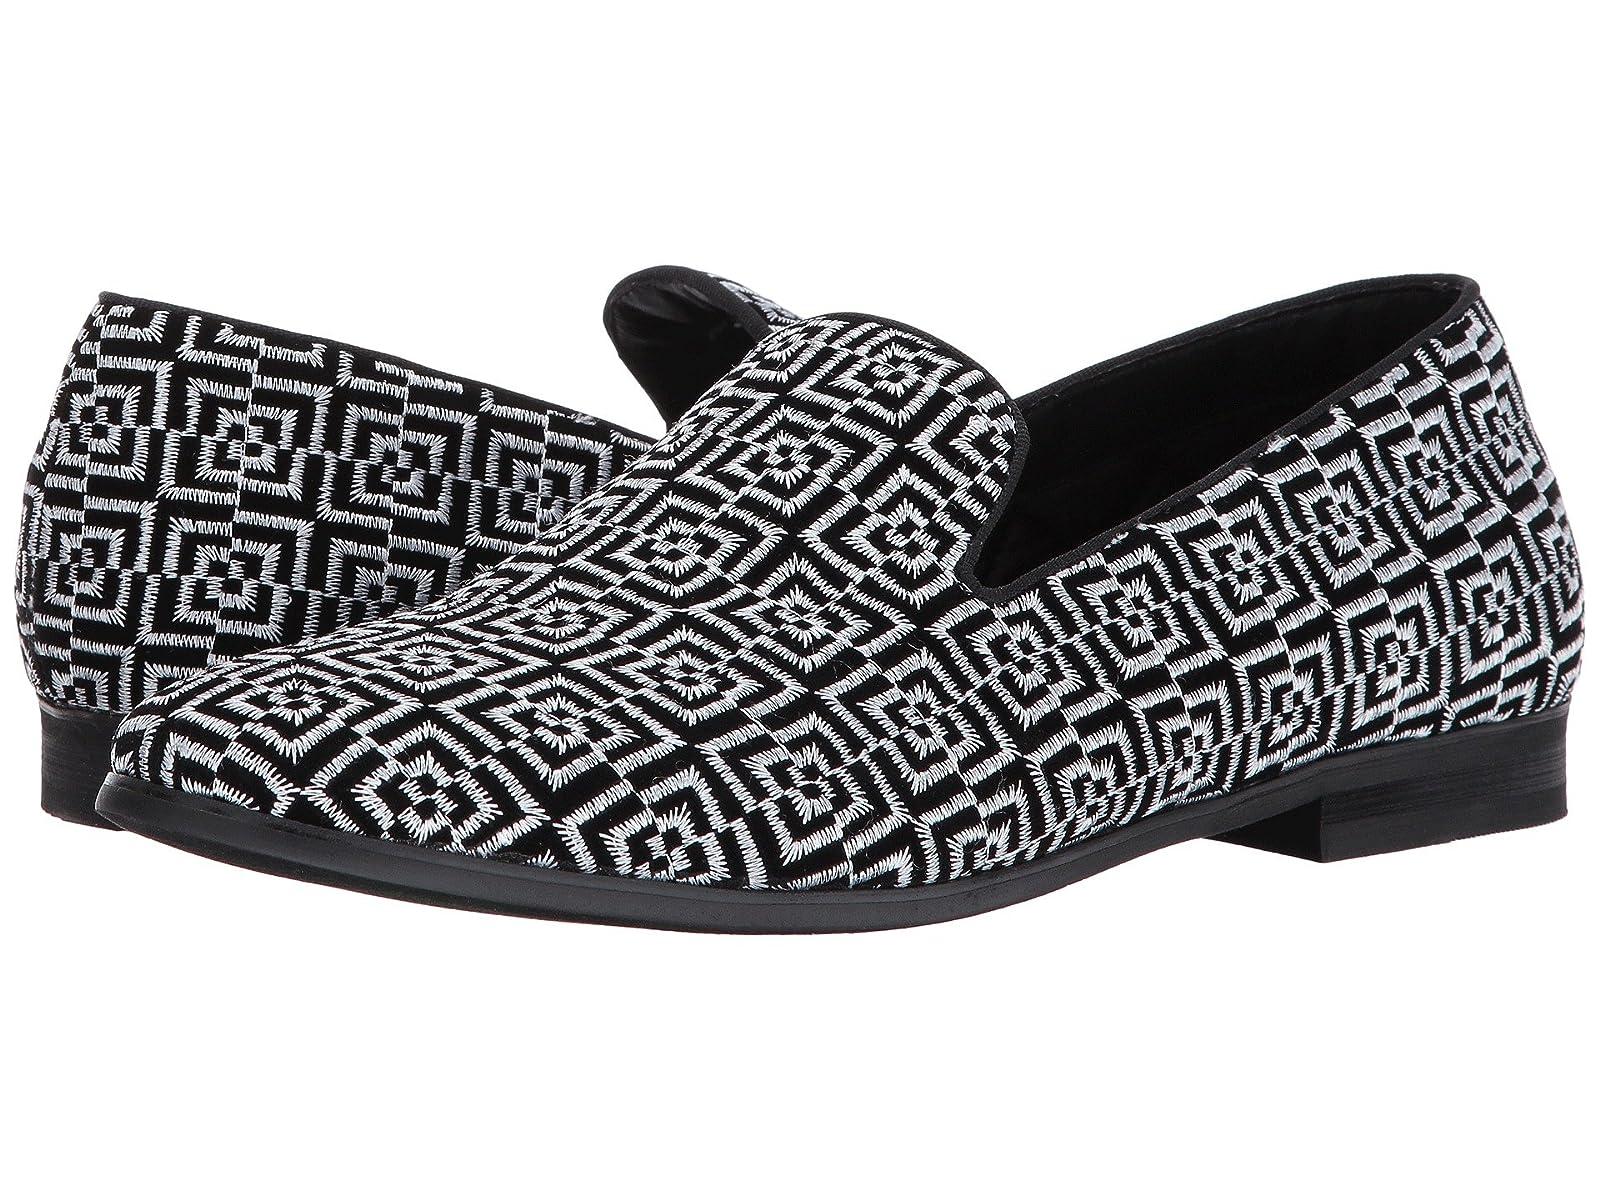 Steve Madden CalculusCheap and distinctive eye-catching shoes